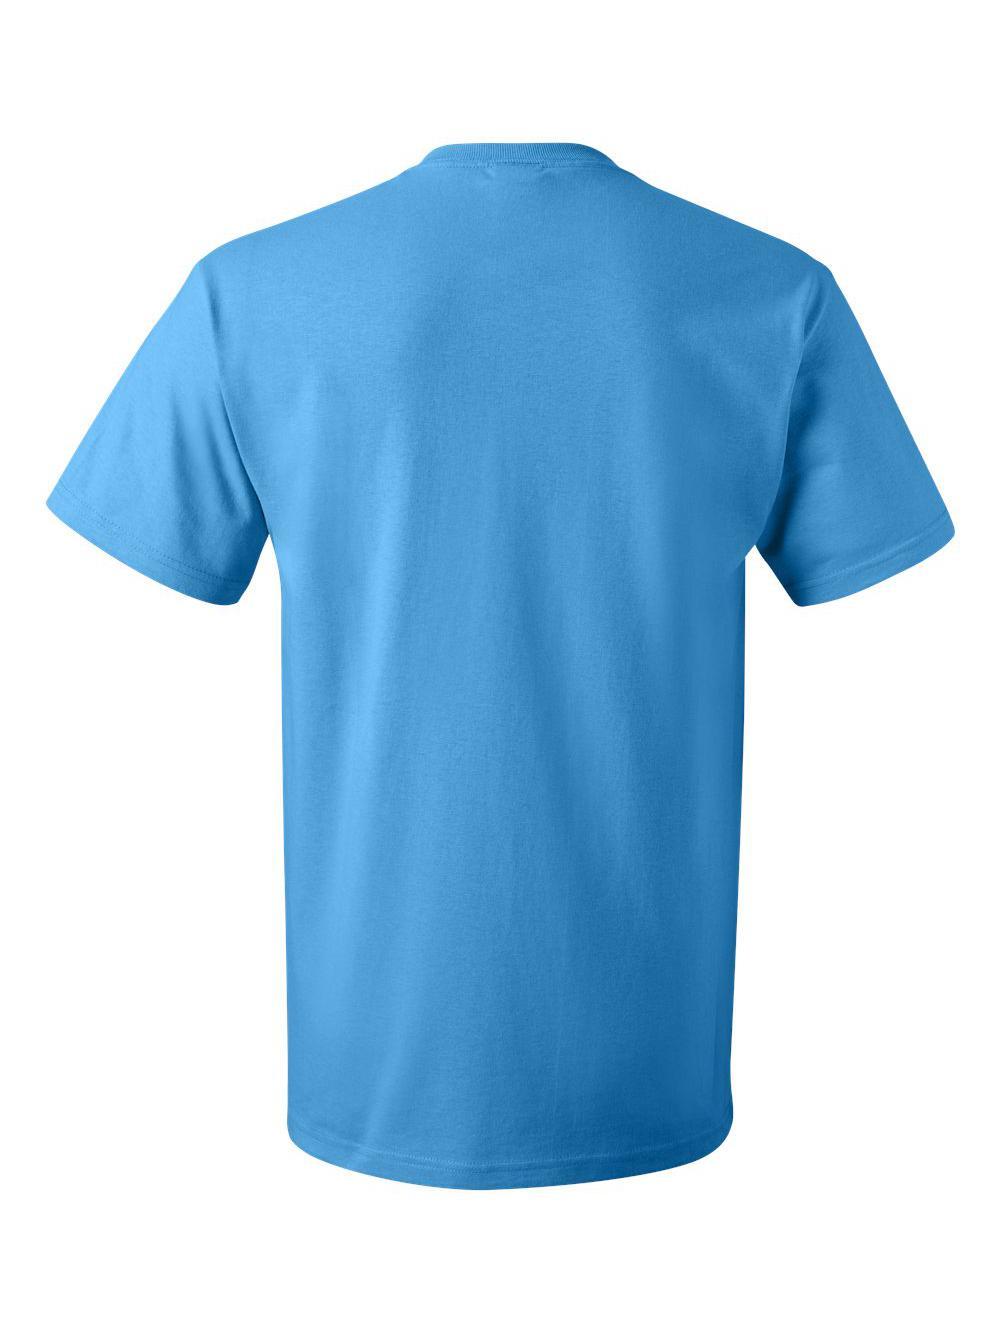 Fruit-of-the-Loom-HD-Cotton-Short-Sleeve-T-Shirt-3930R thumbnail 91